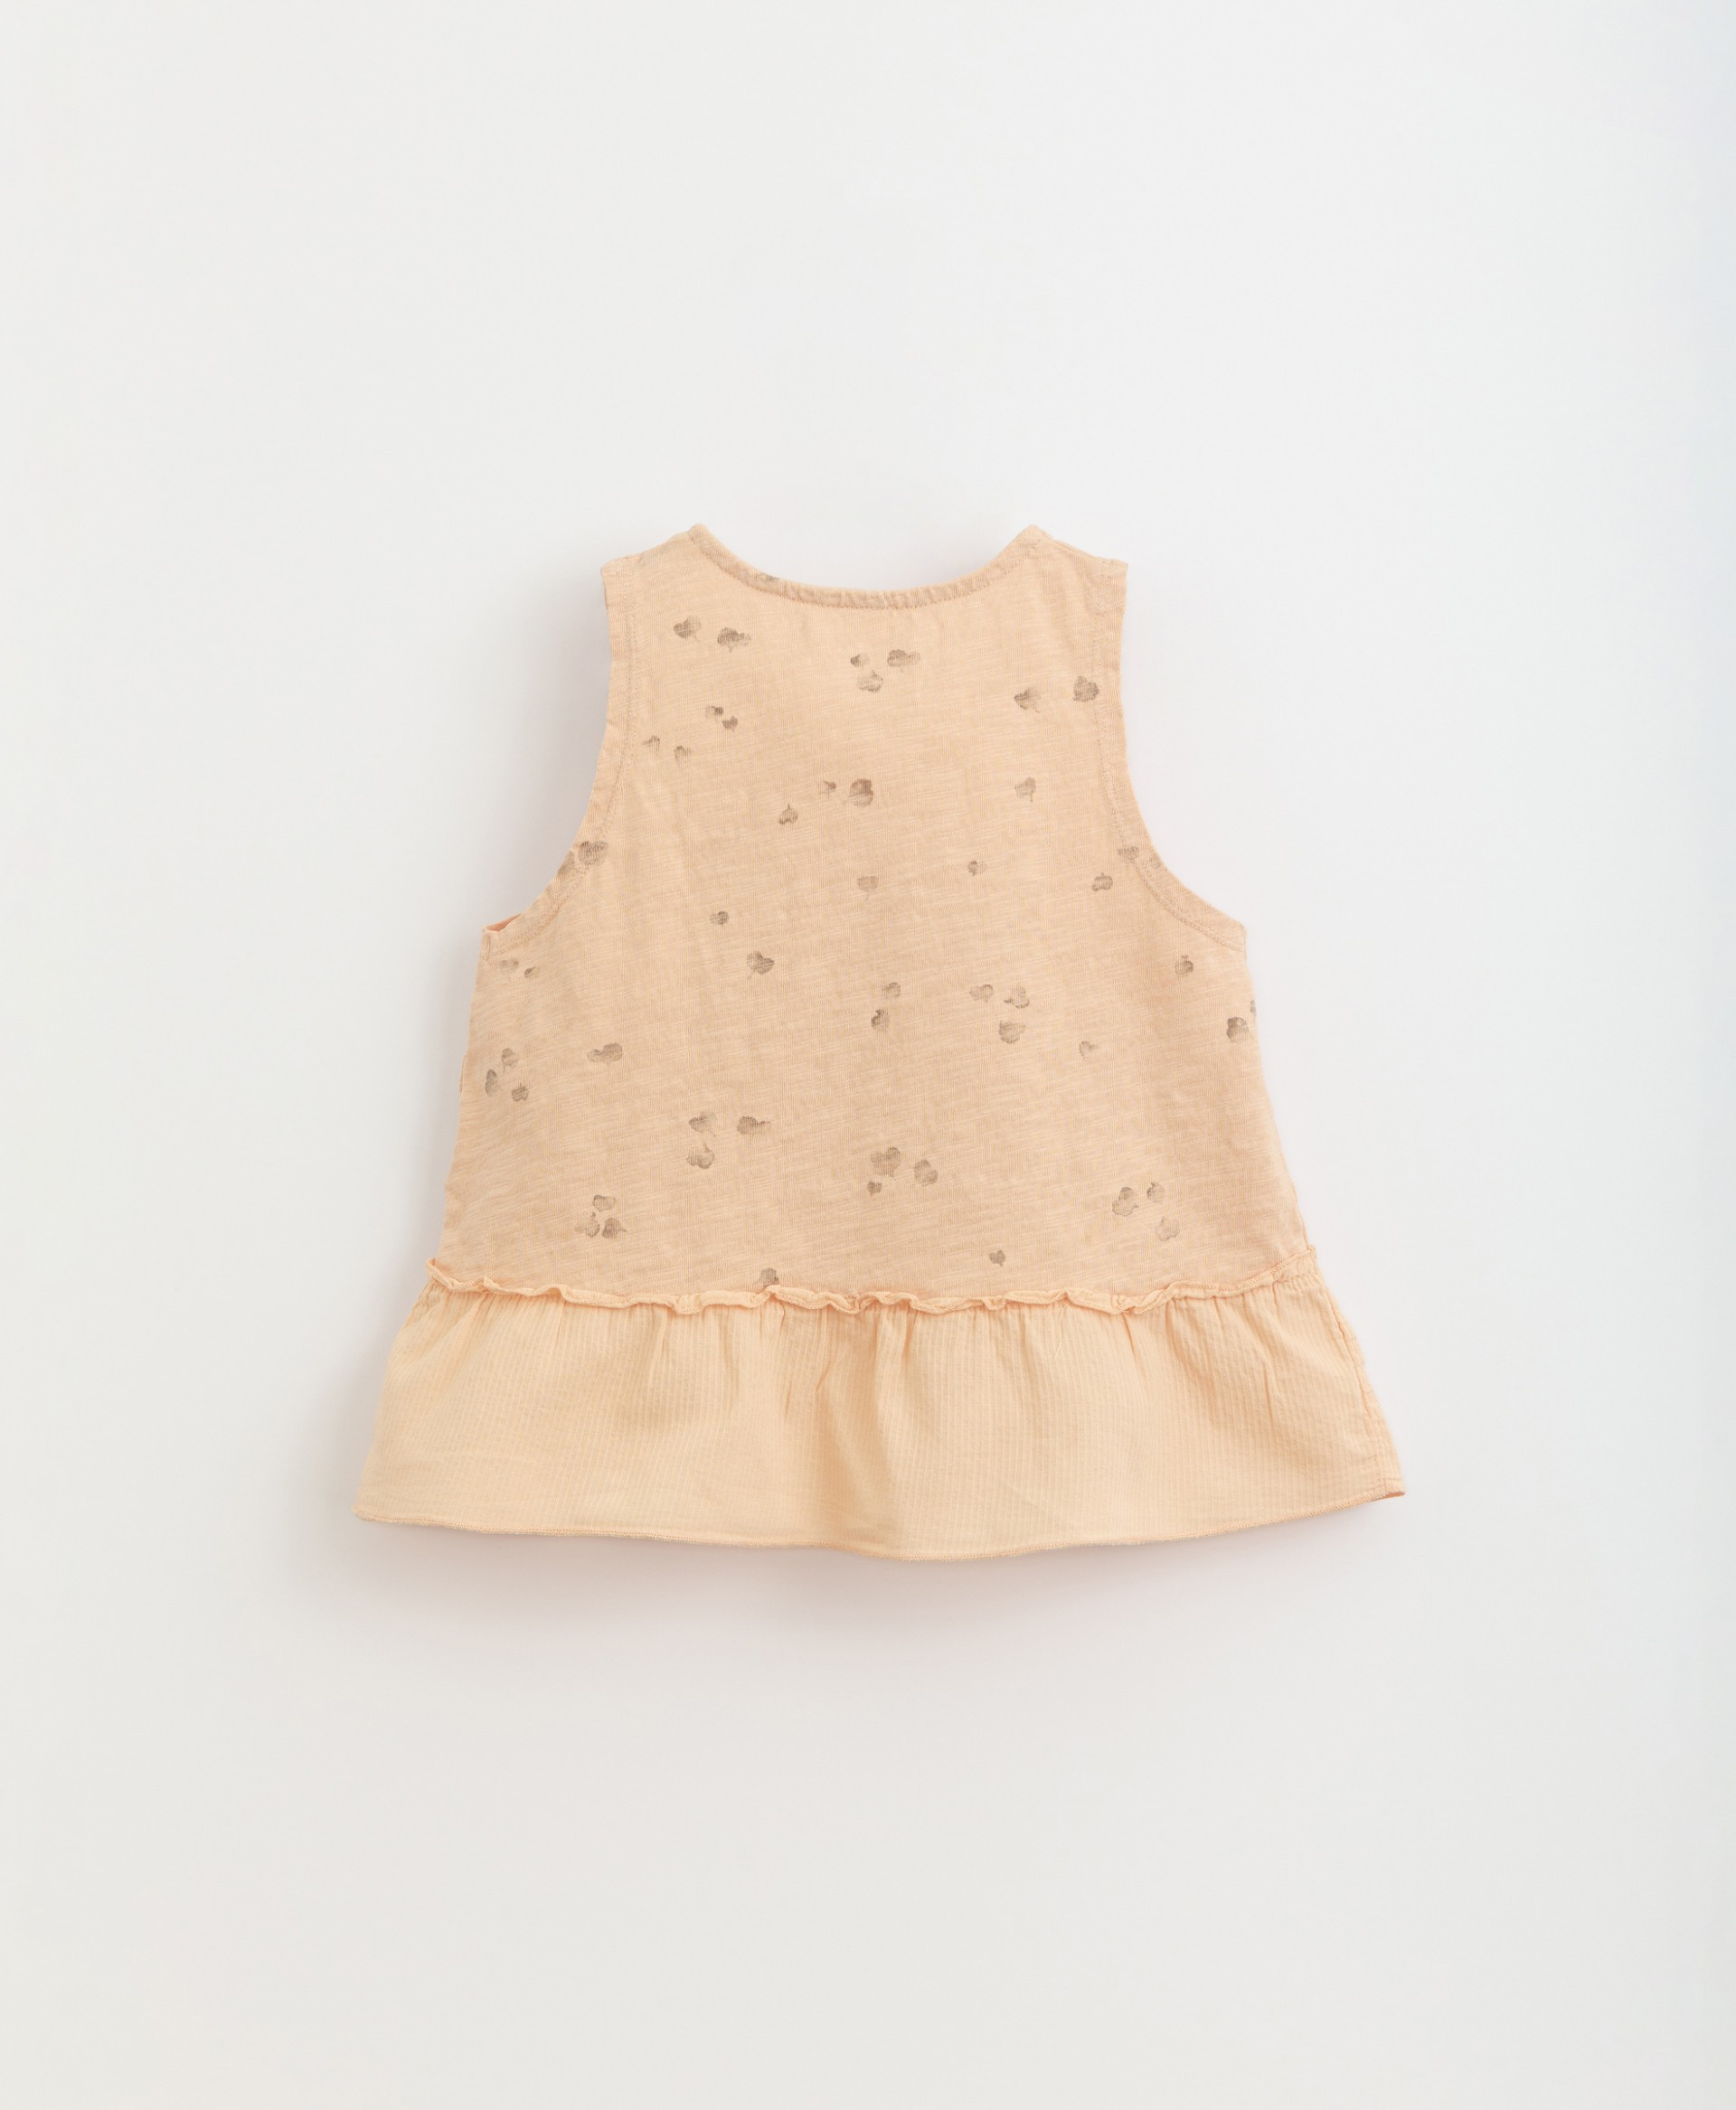 Pijama de algodón orgánico | Botany